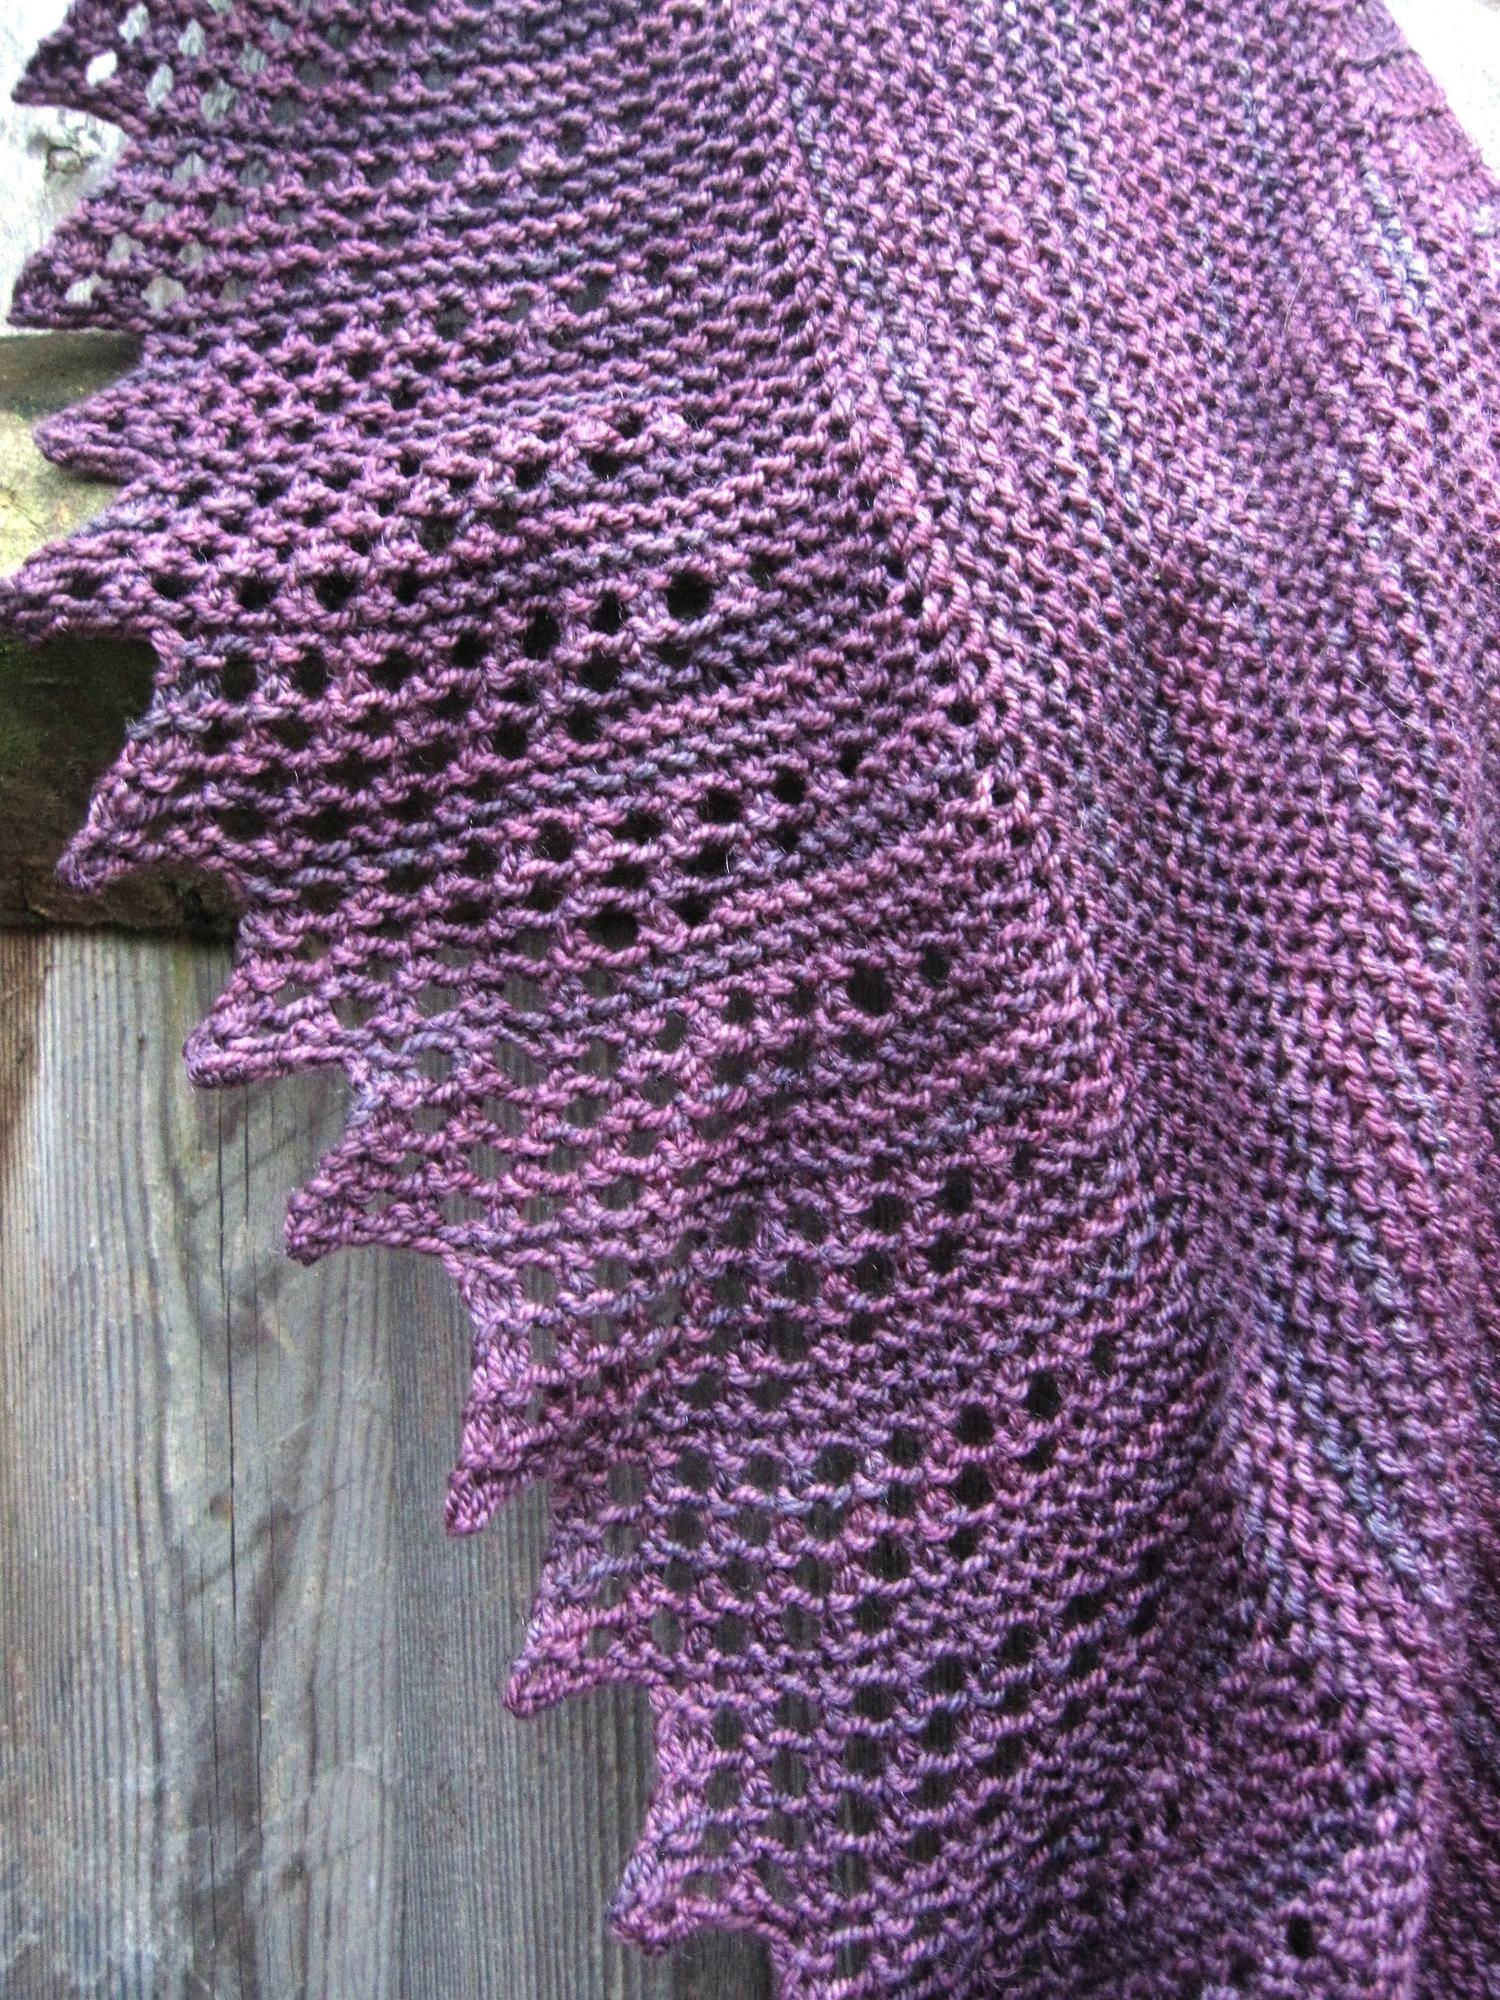 Luscious, luxury sock yarn